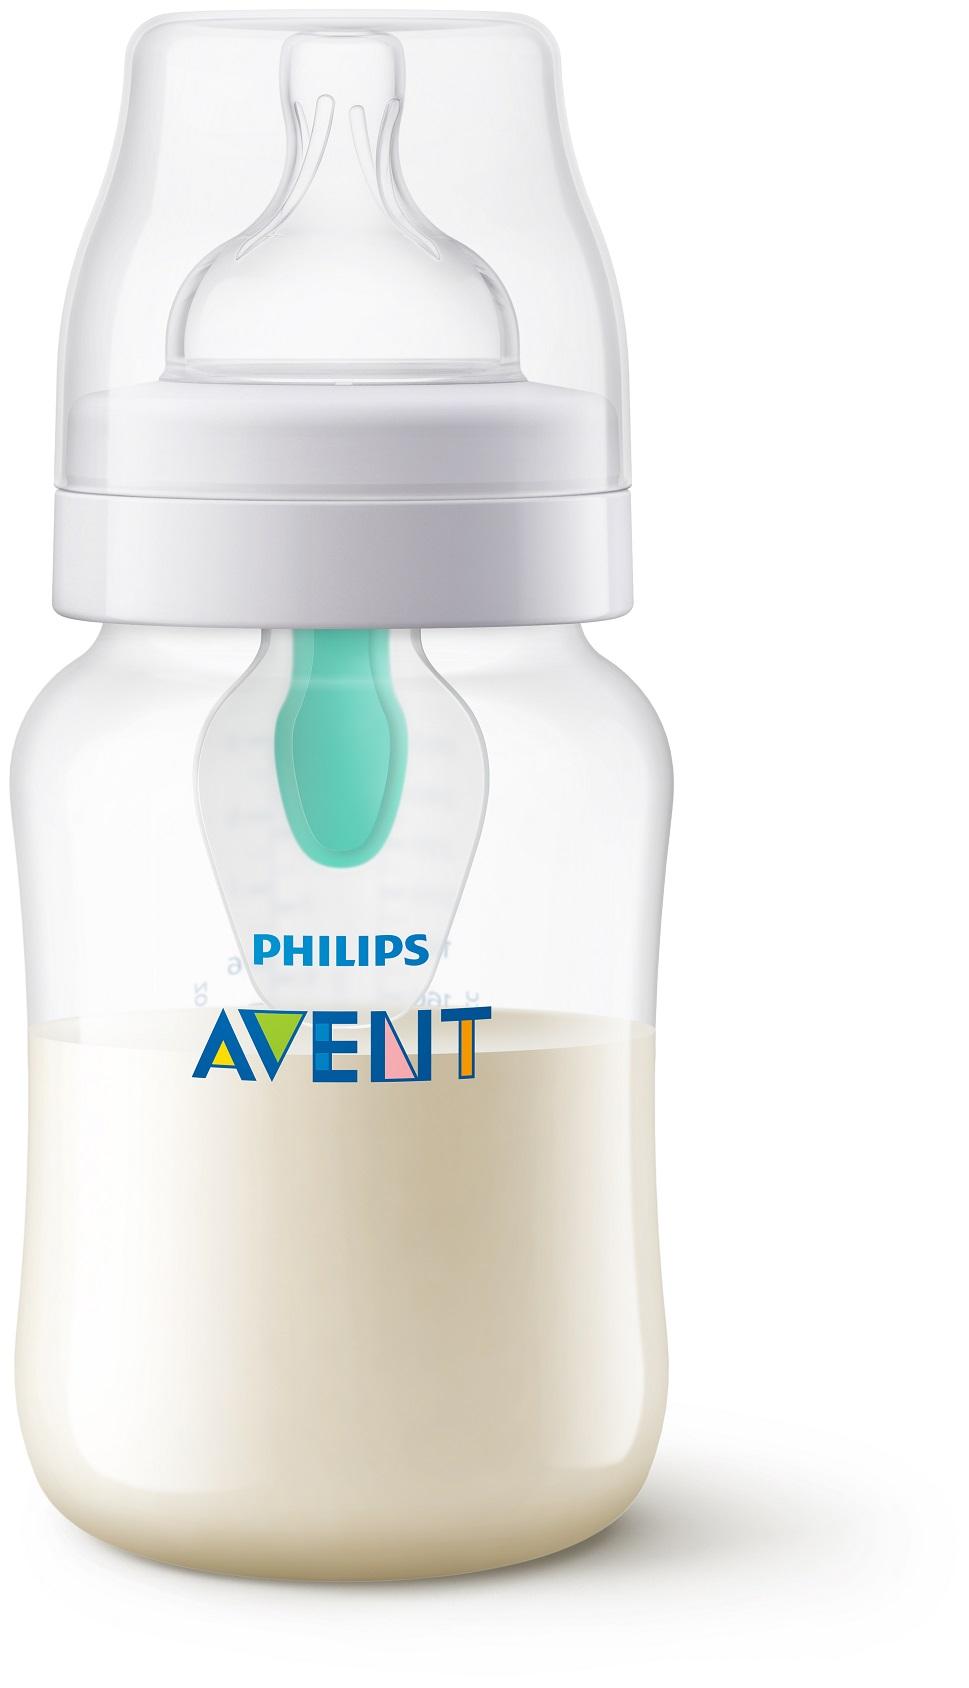 PHILIPS AVENT Láhev Anti-colic s ventilem AirFree, 1 ks 260 ml